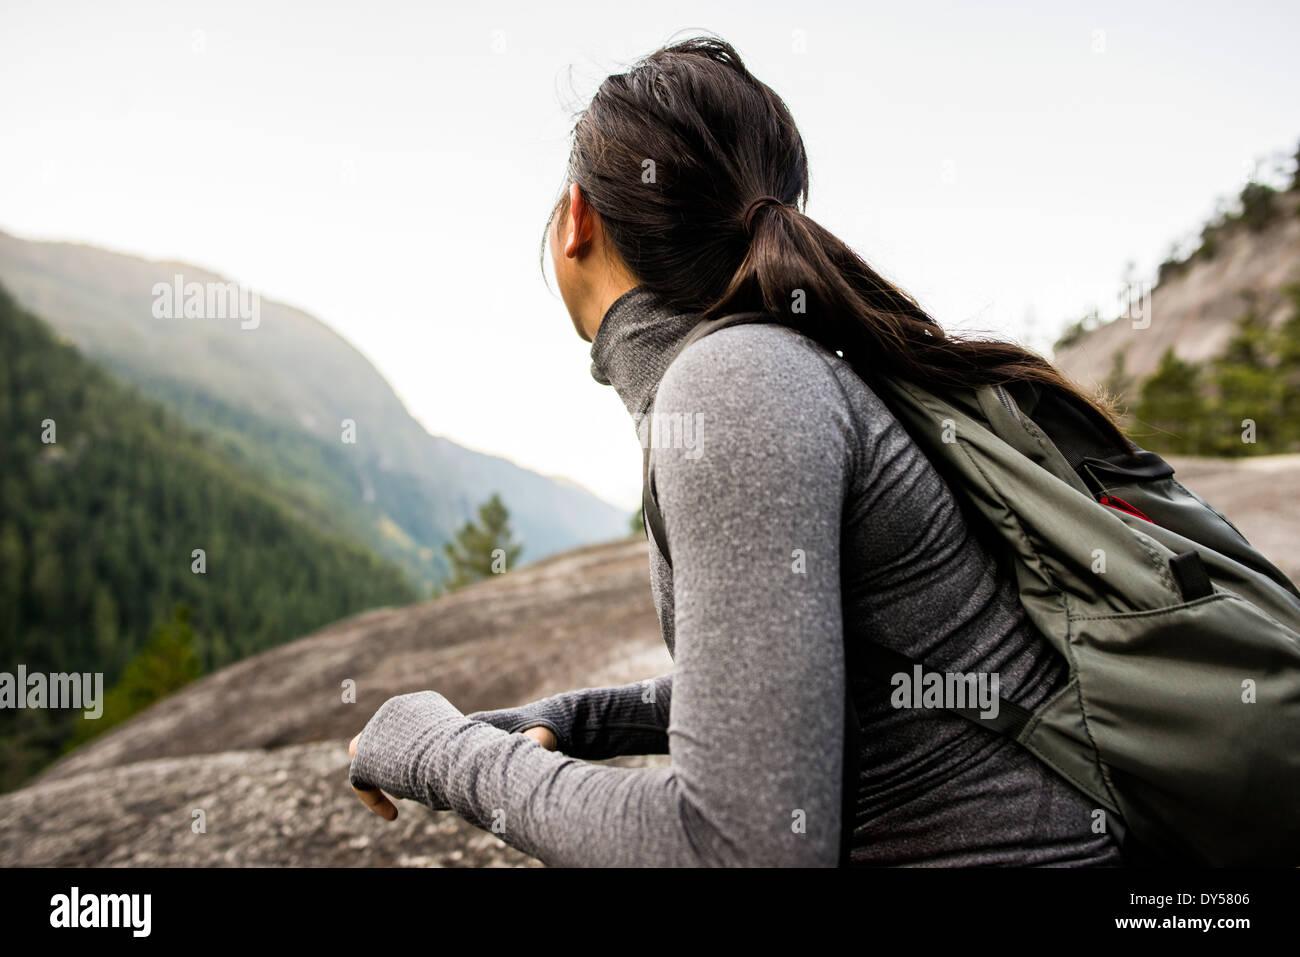 Mujer joven mirando a ver, Squamish, British Columbia, Canadá Imagen De Stock